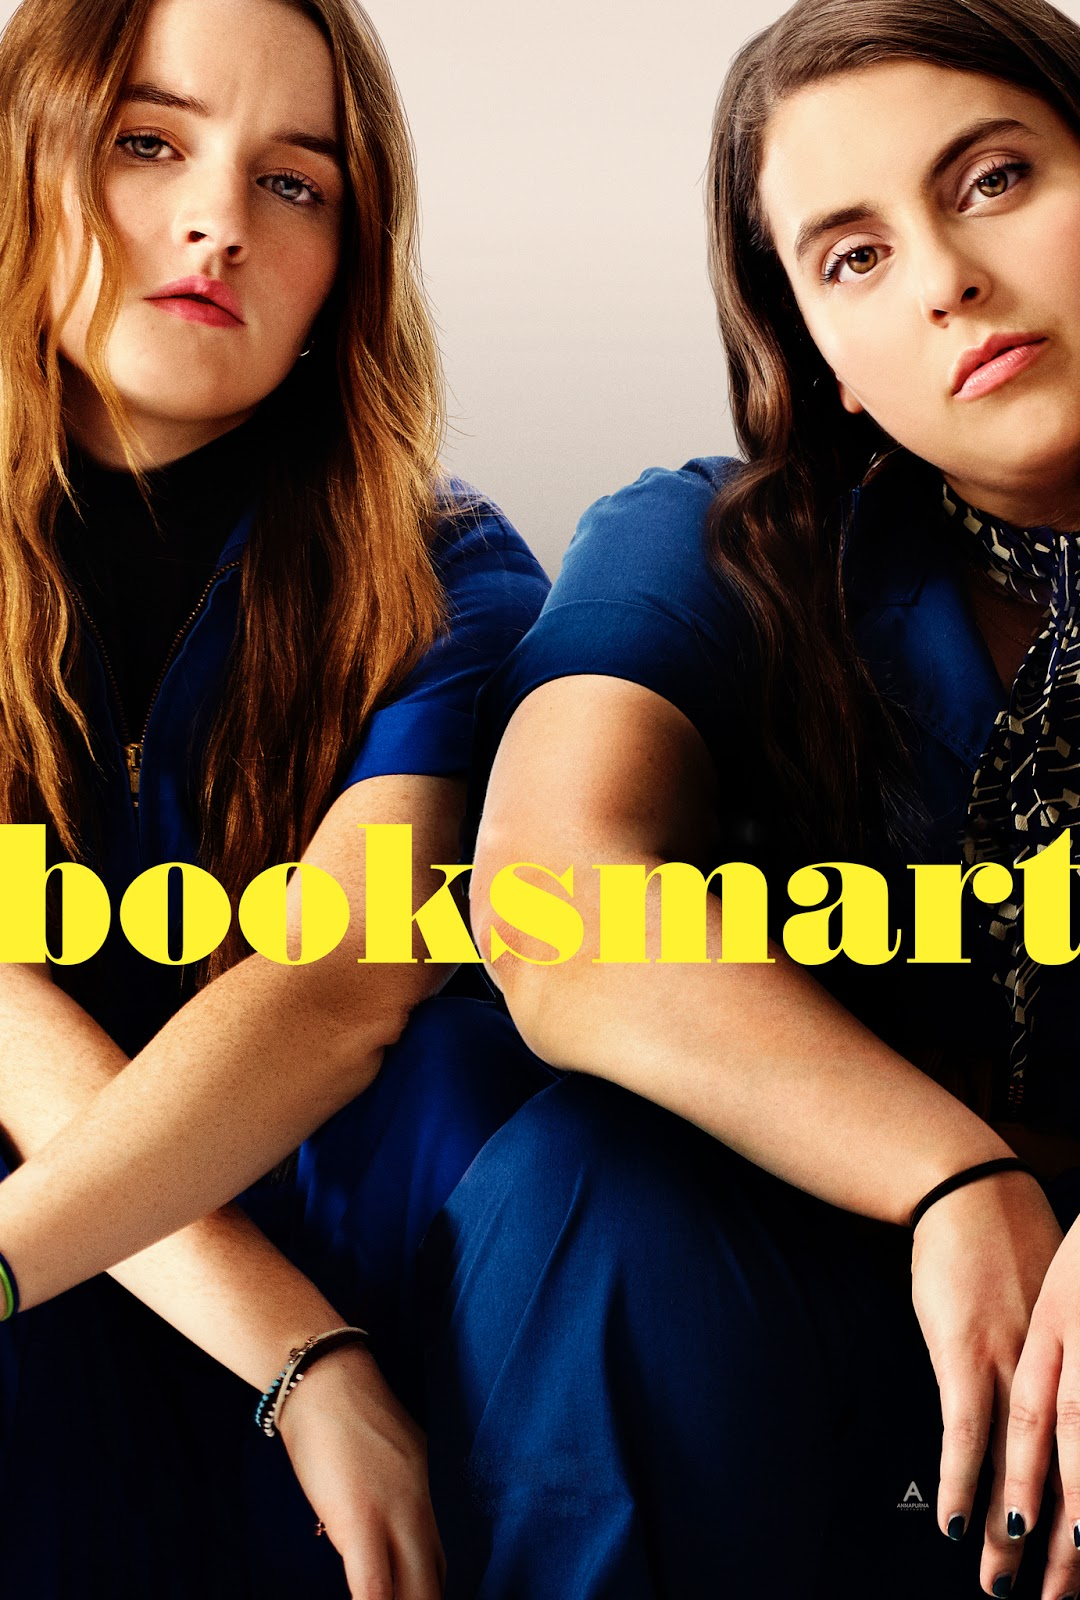 Booksmart [2019] [DVDR] [NTSC] [Subtitulado]